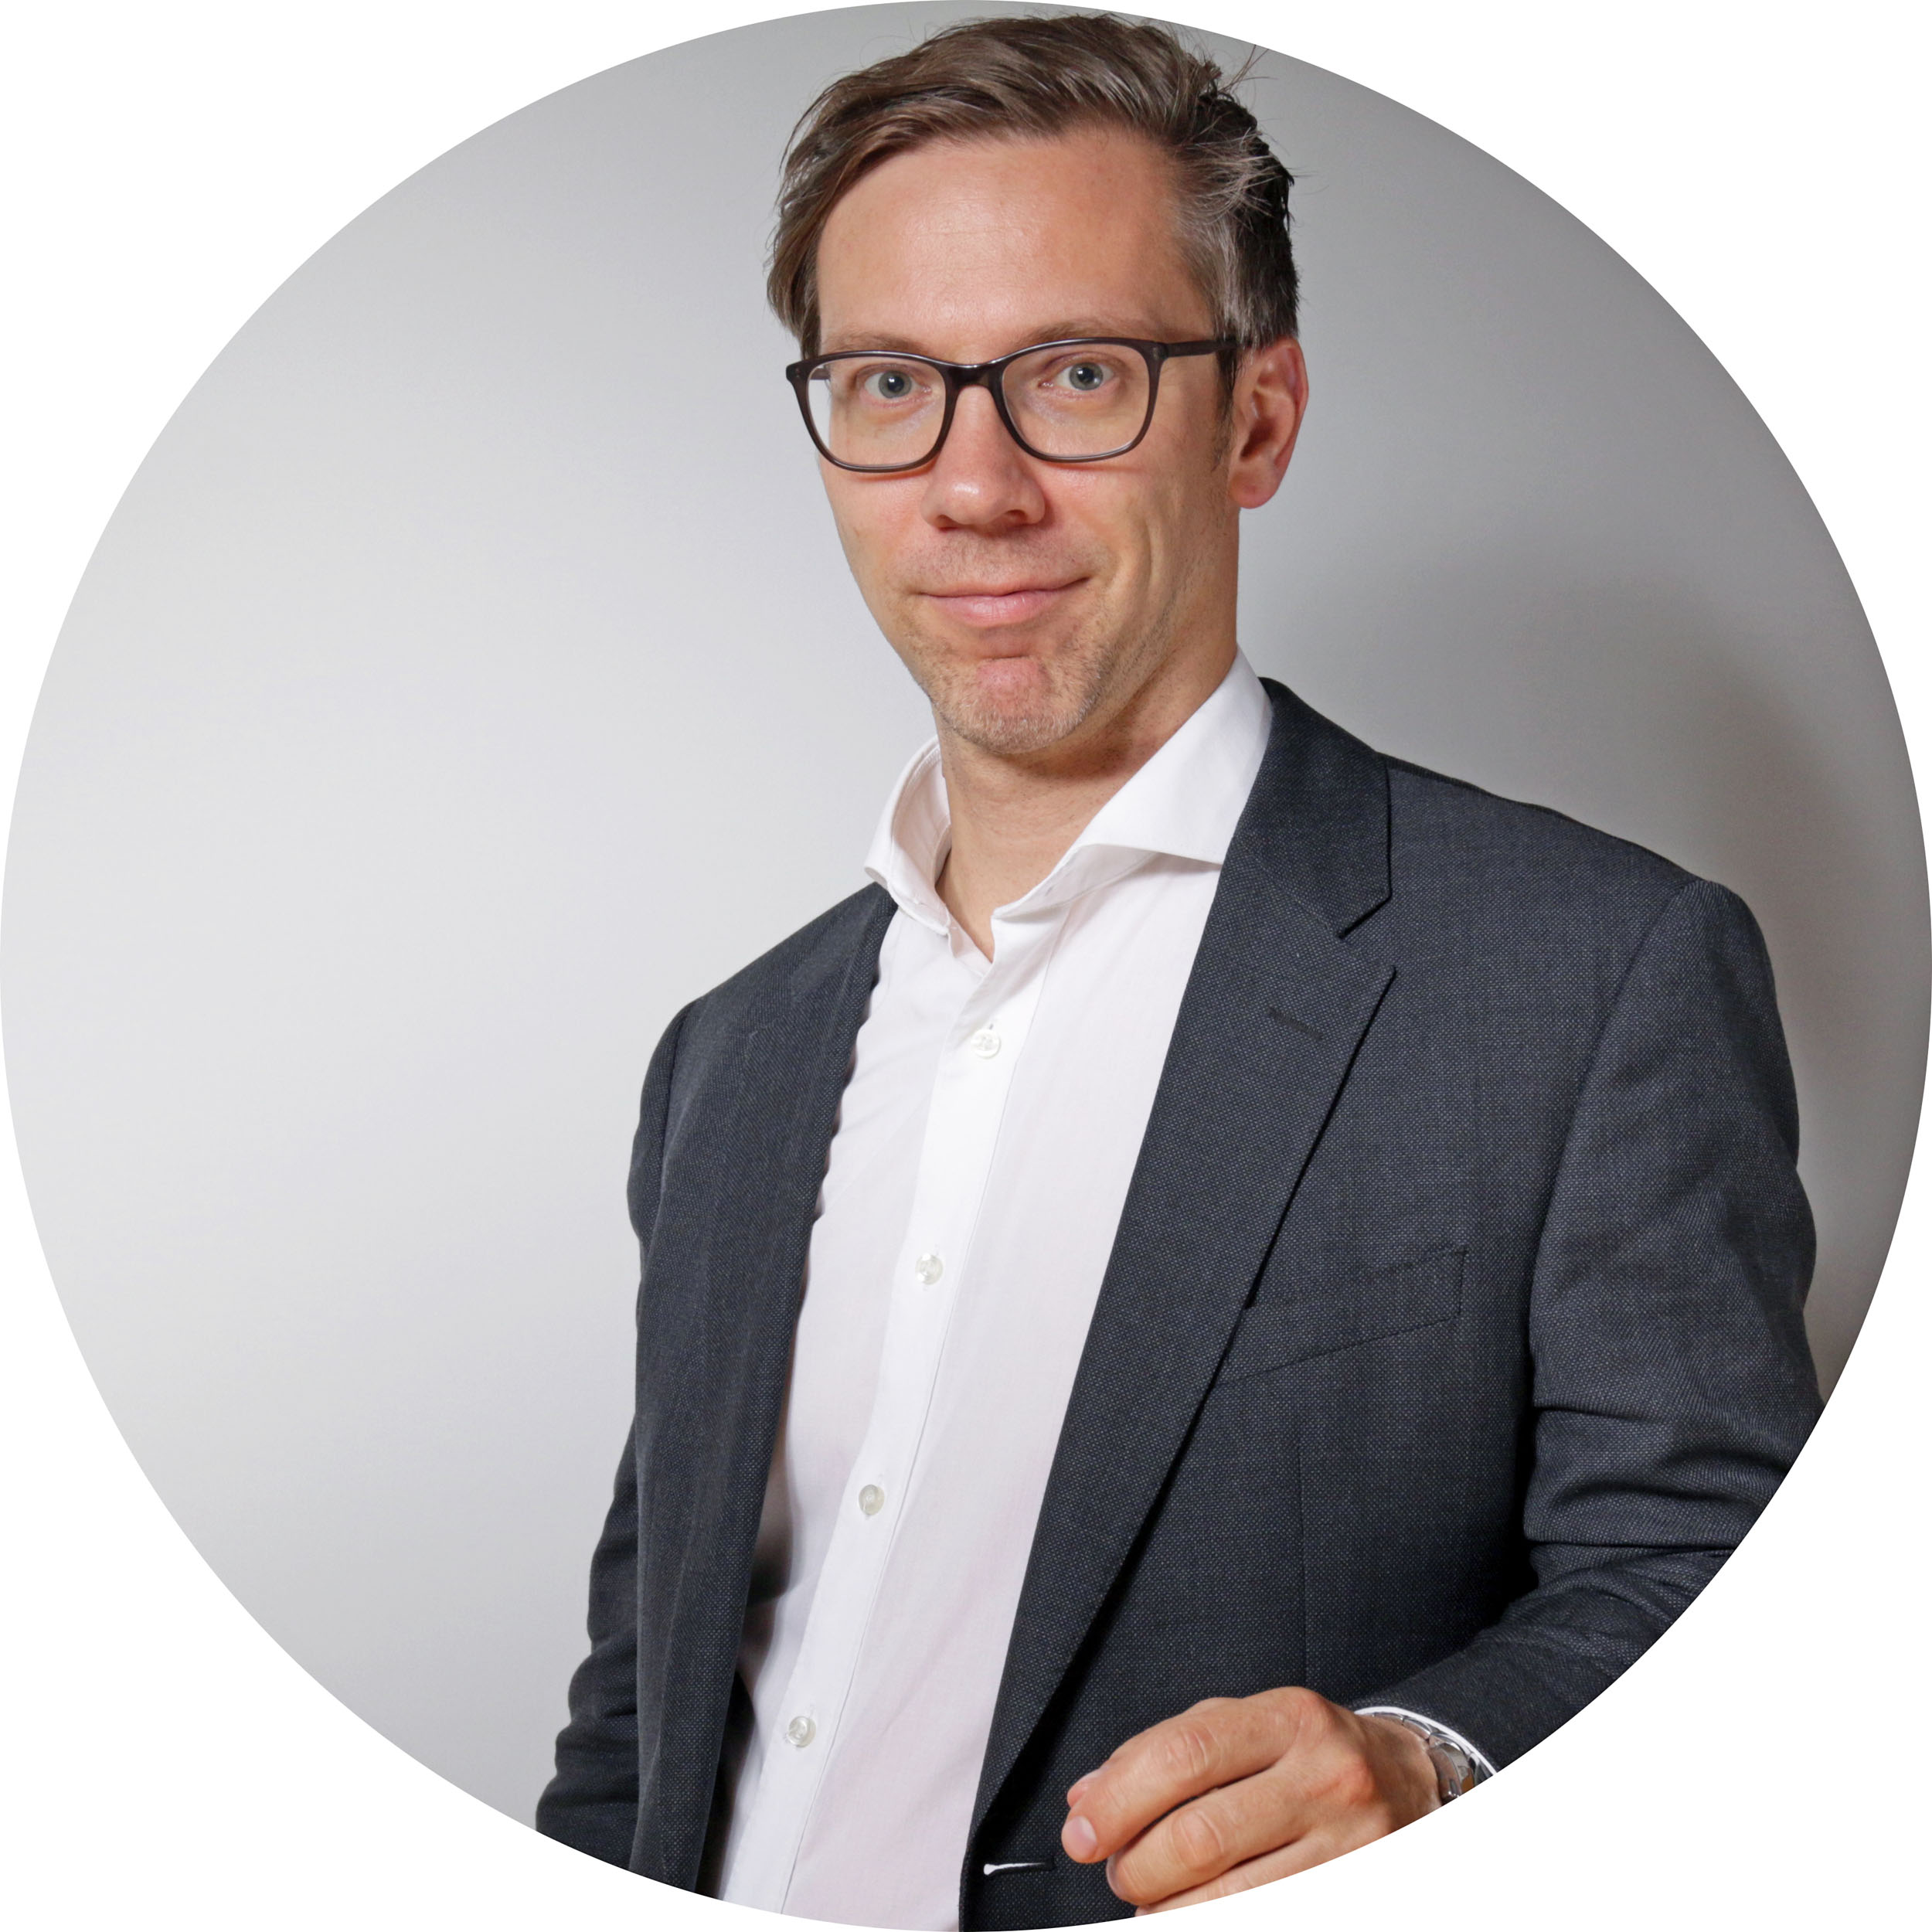 Michael C. Schmitt, Michael Schmitt, PR-Berater München und Würzburg